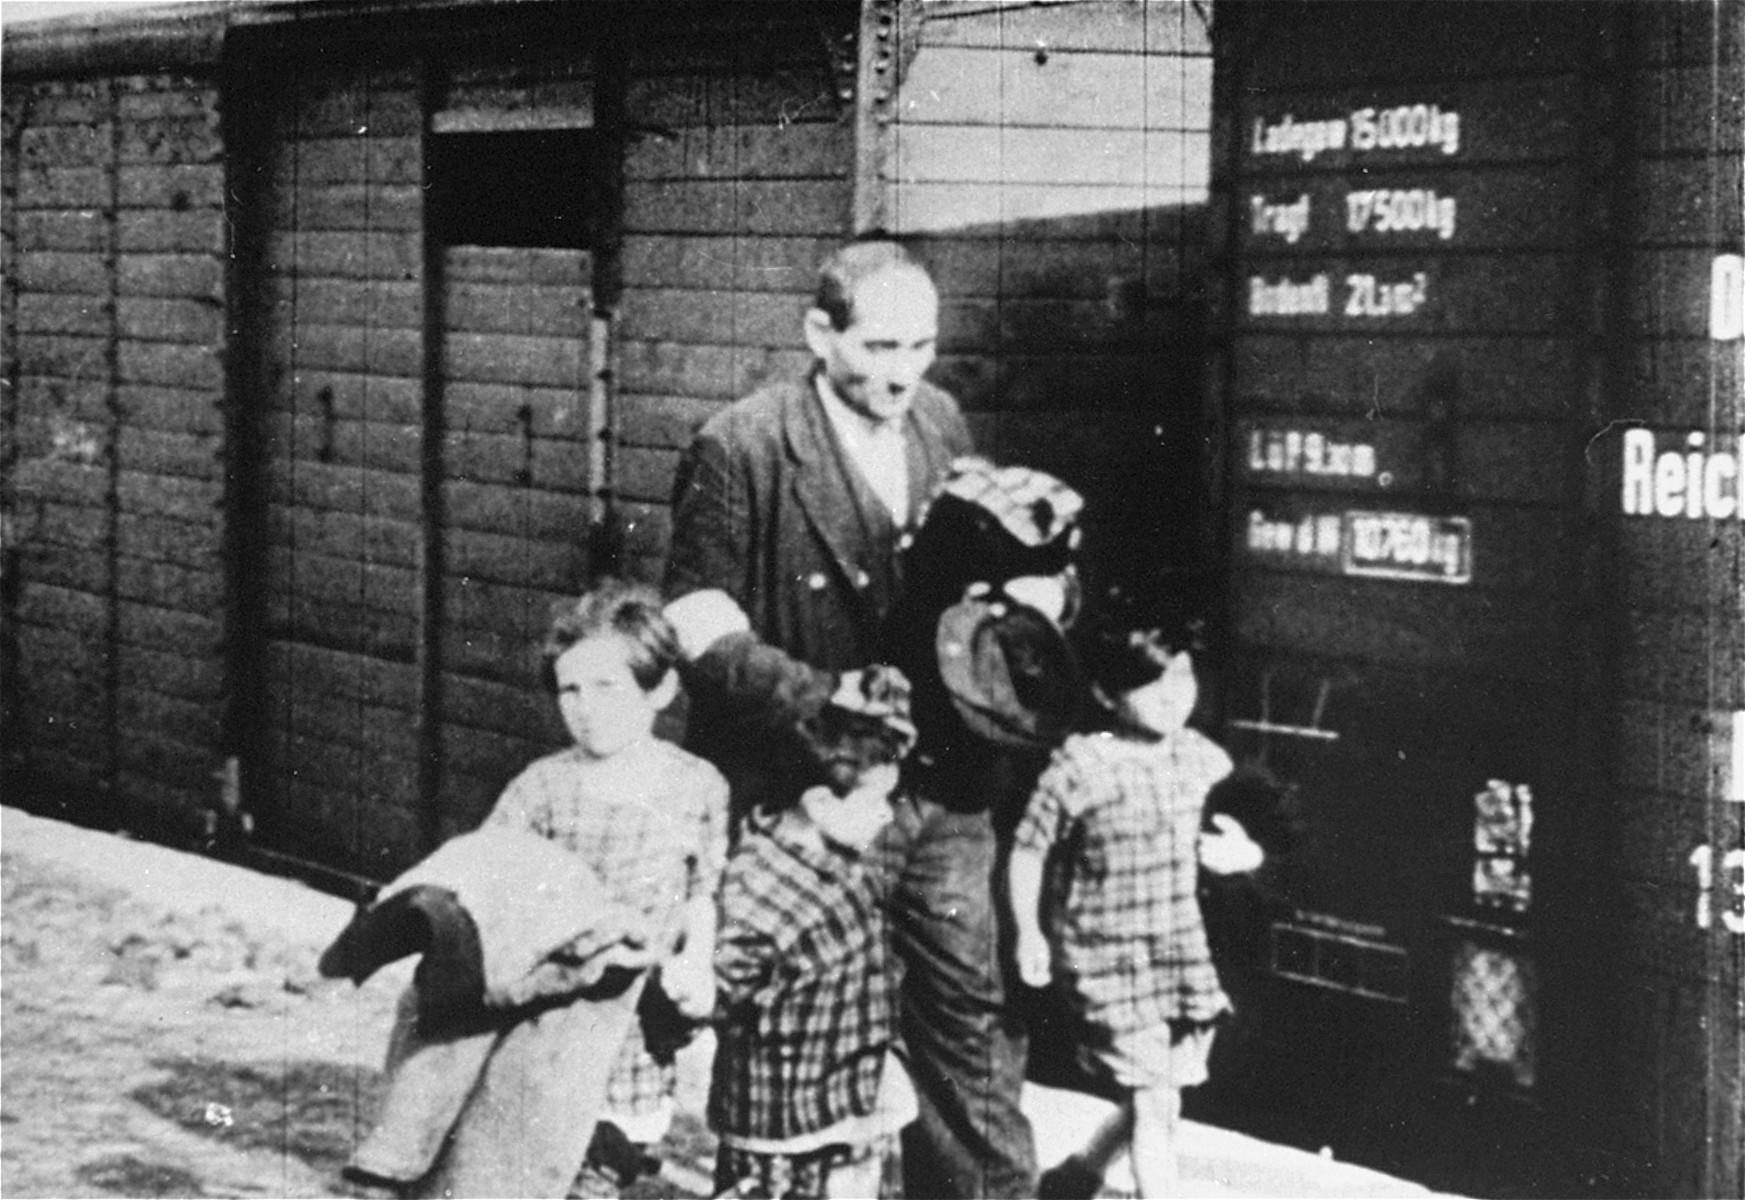 A Jewish man walks with three young children alongside a deportation train.